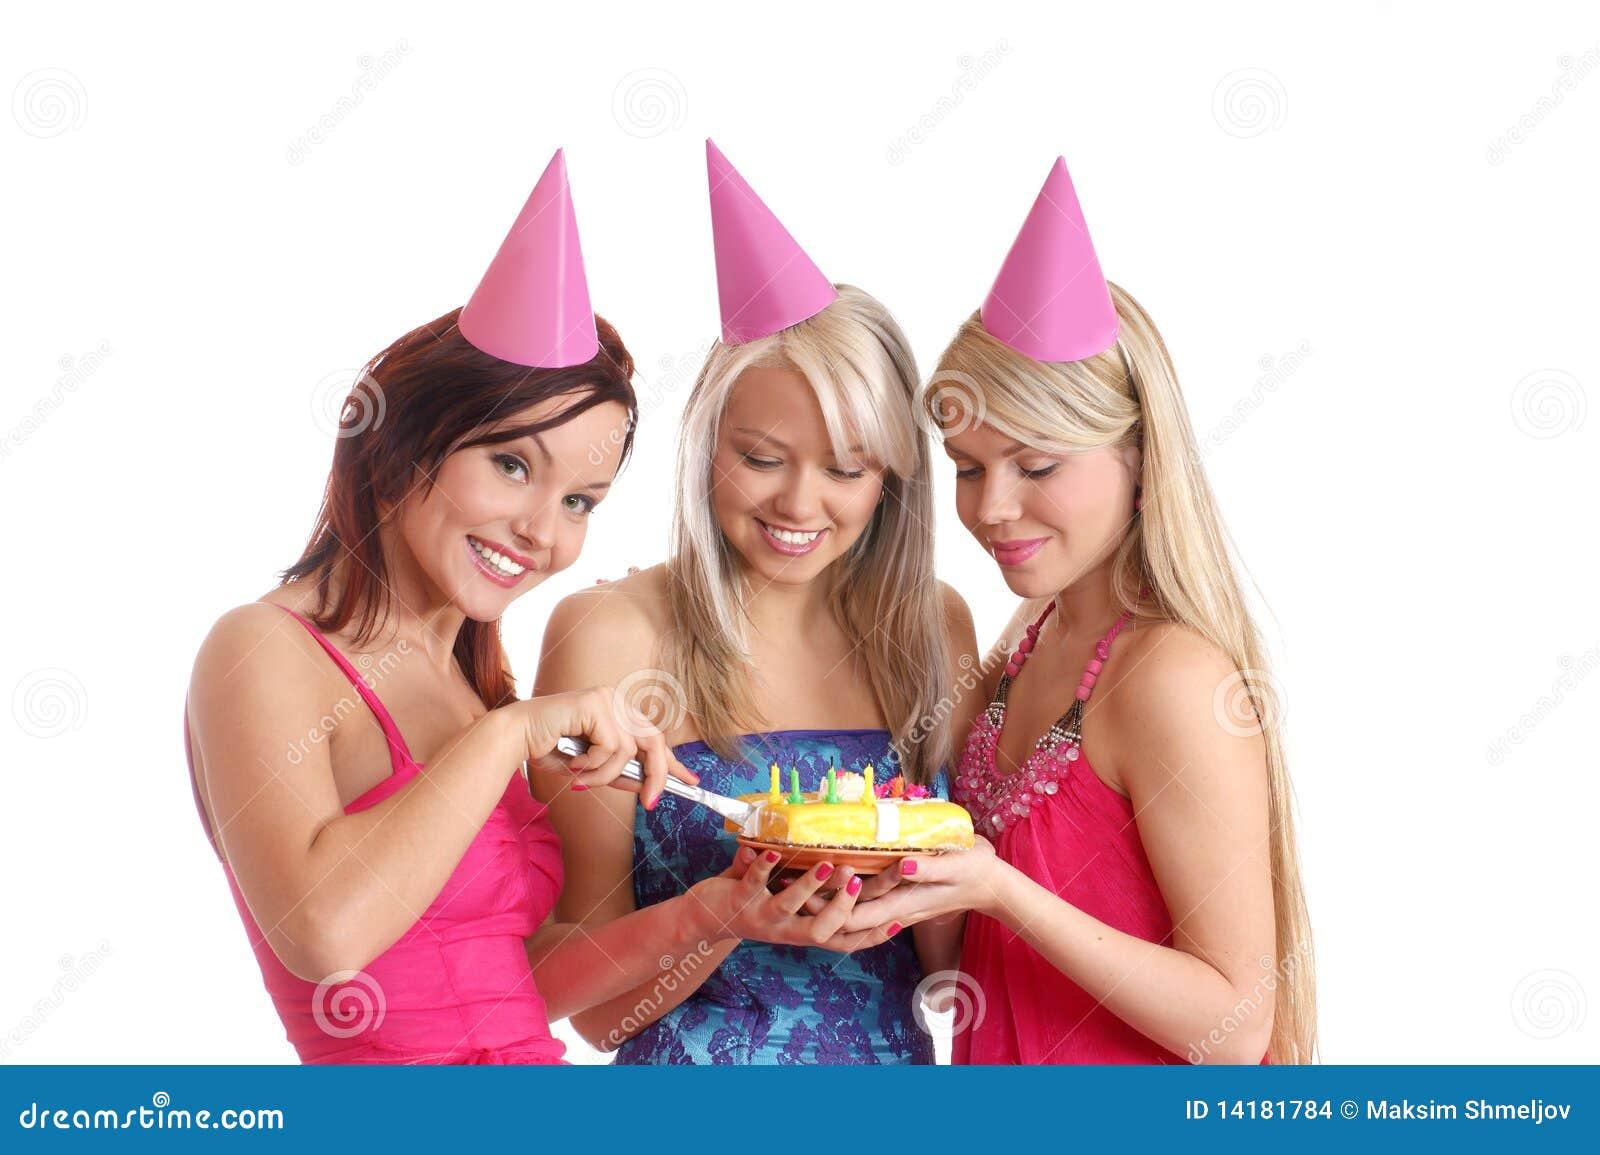 Birthday Portrait Contract » Mason Ohio Portrait Photography by Birthday party photography contract